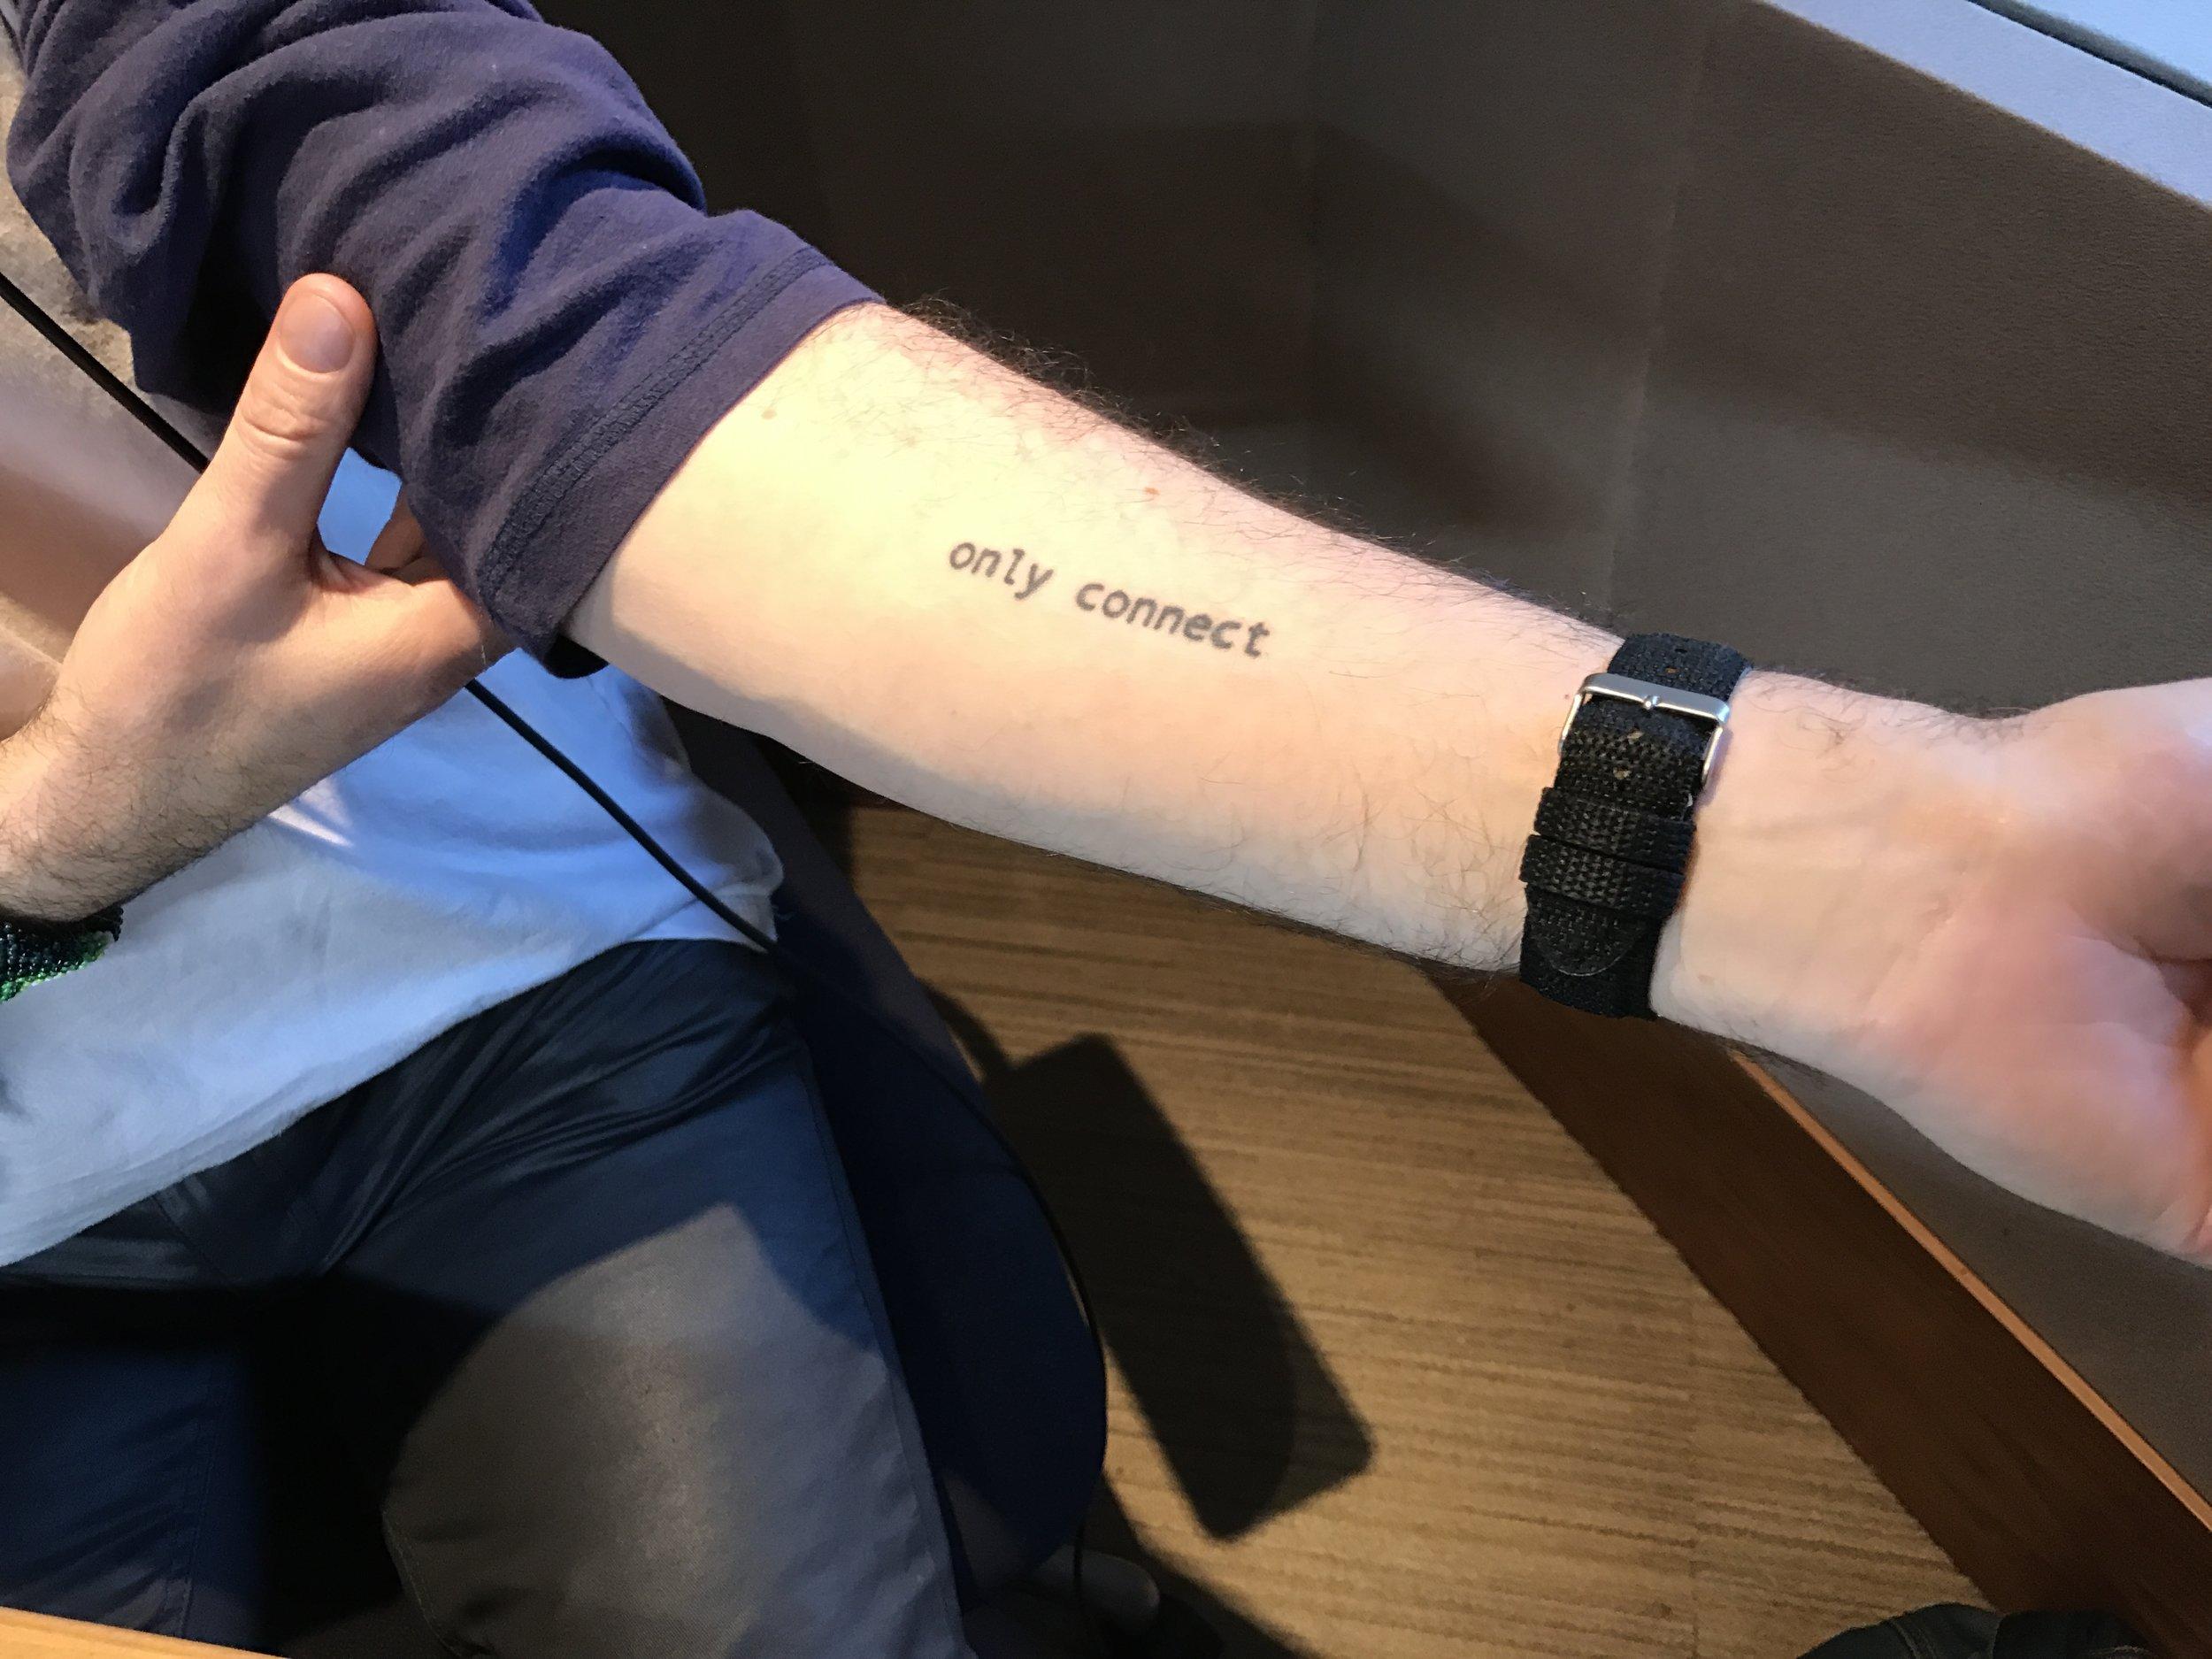 Alan Cumming's E.M. Forster tattoo.